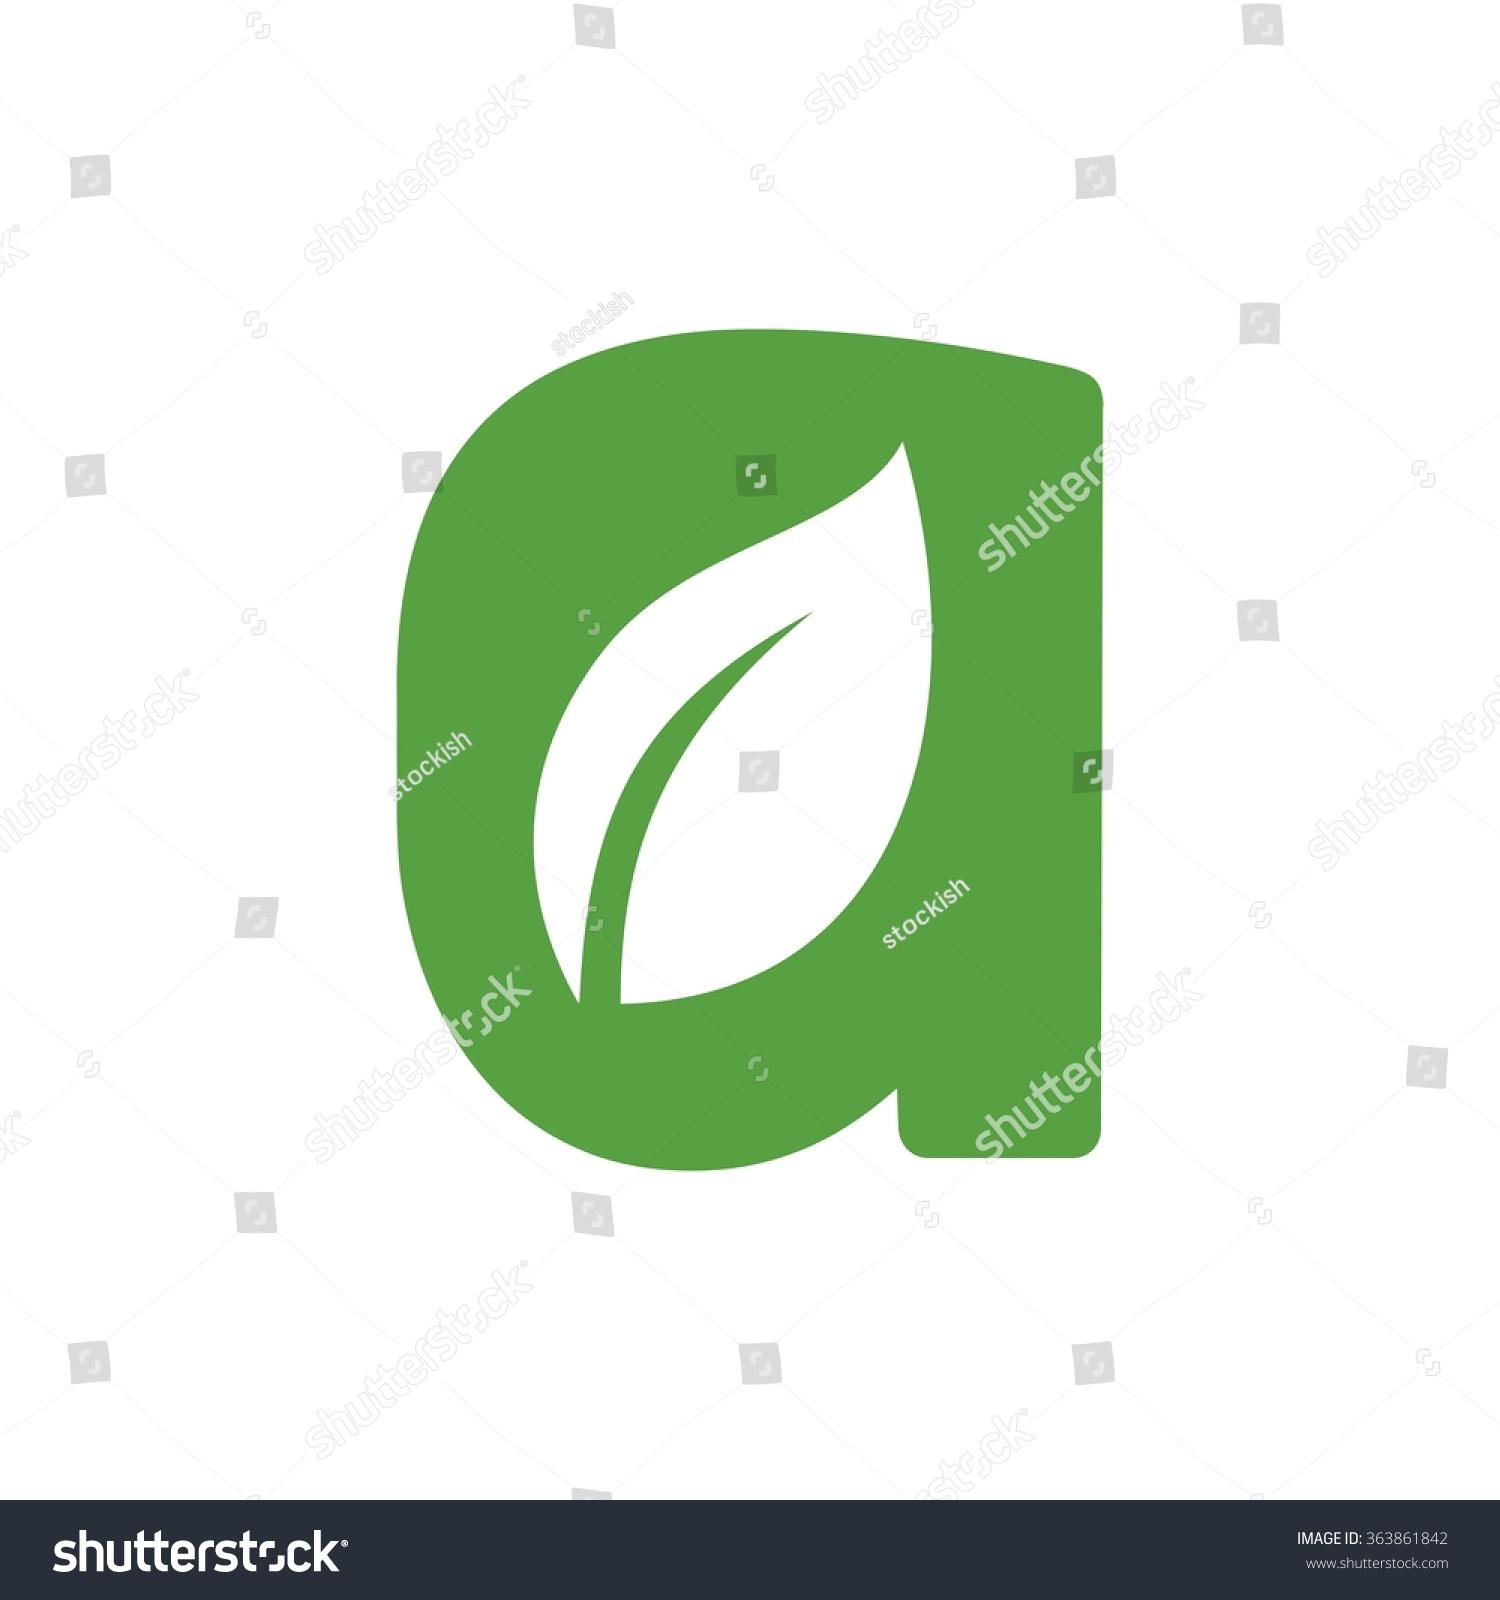 Letter leaf symbol logo vector stock vector 363861842 shutterstock letter a with leaf symbol logo vector biocorpaavc Gallery